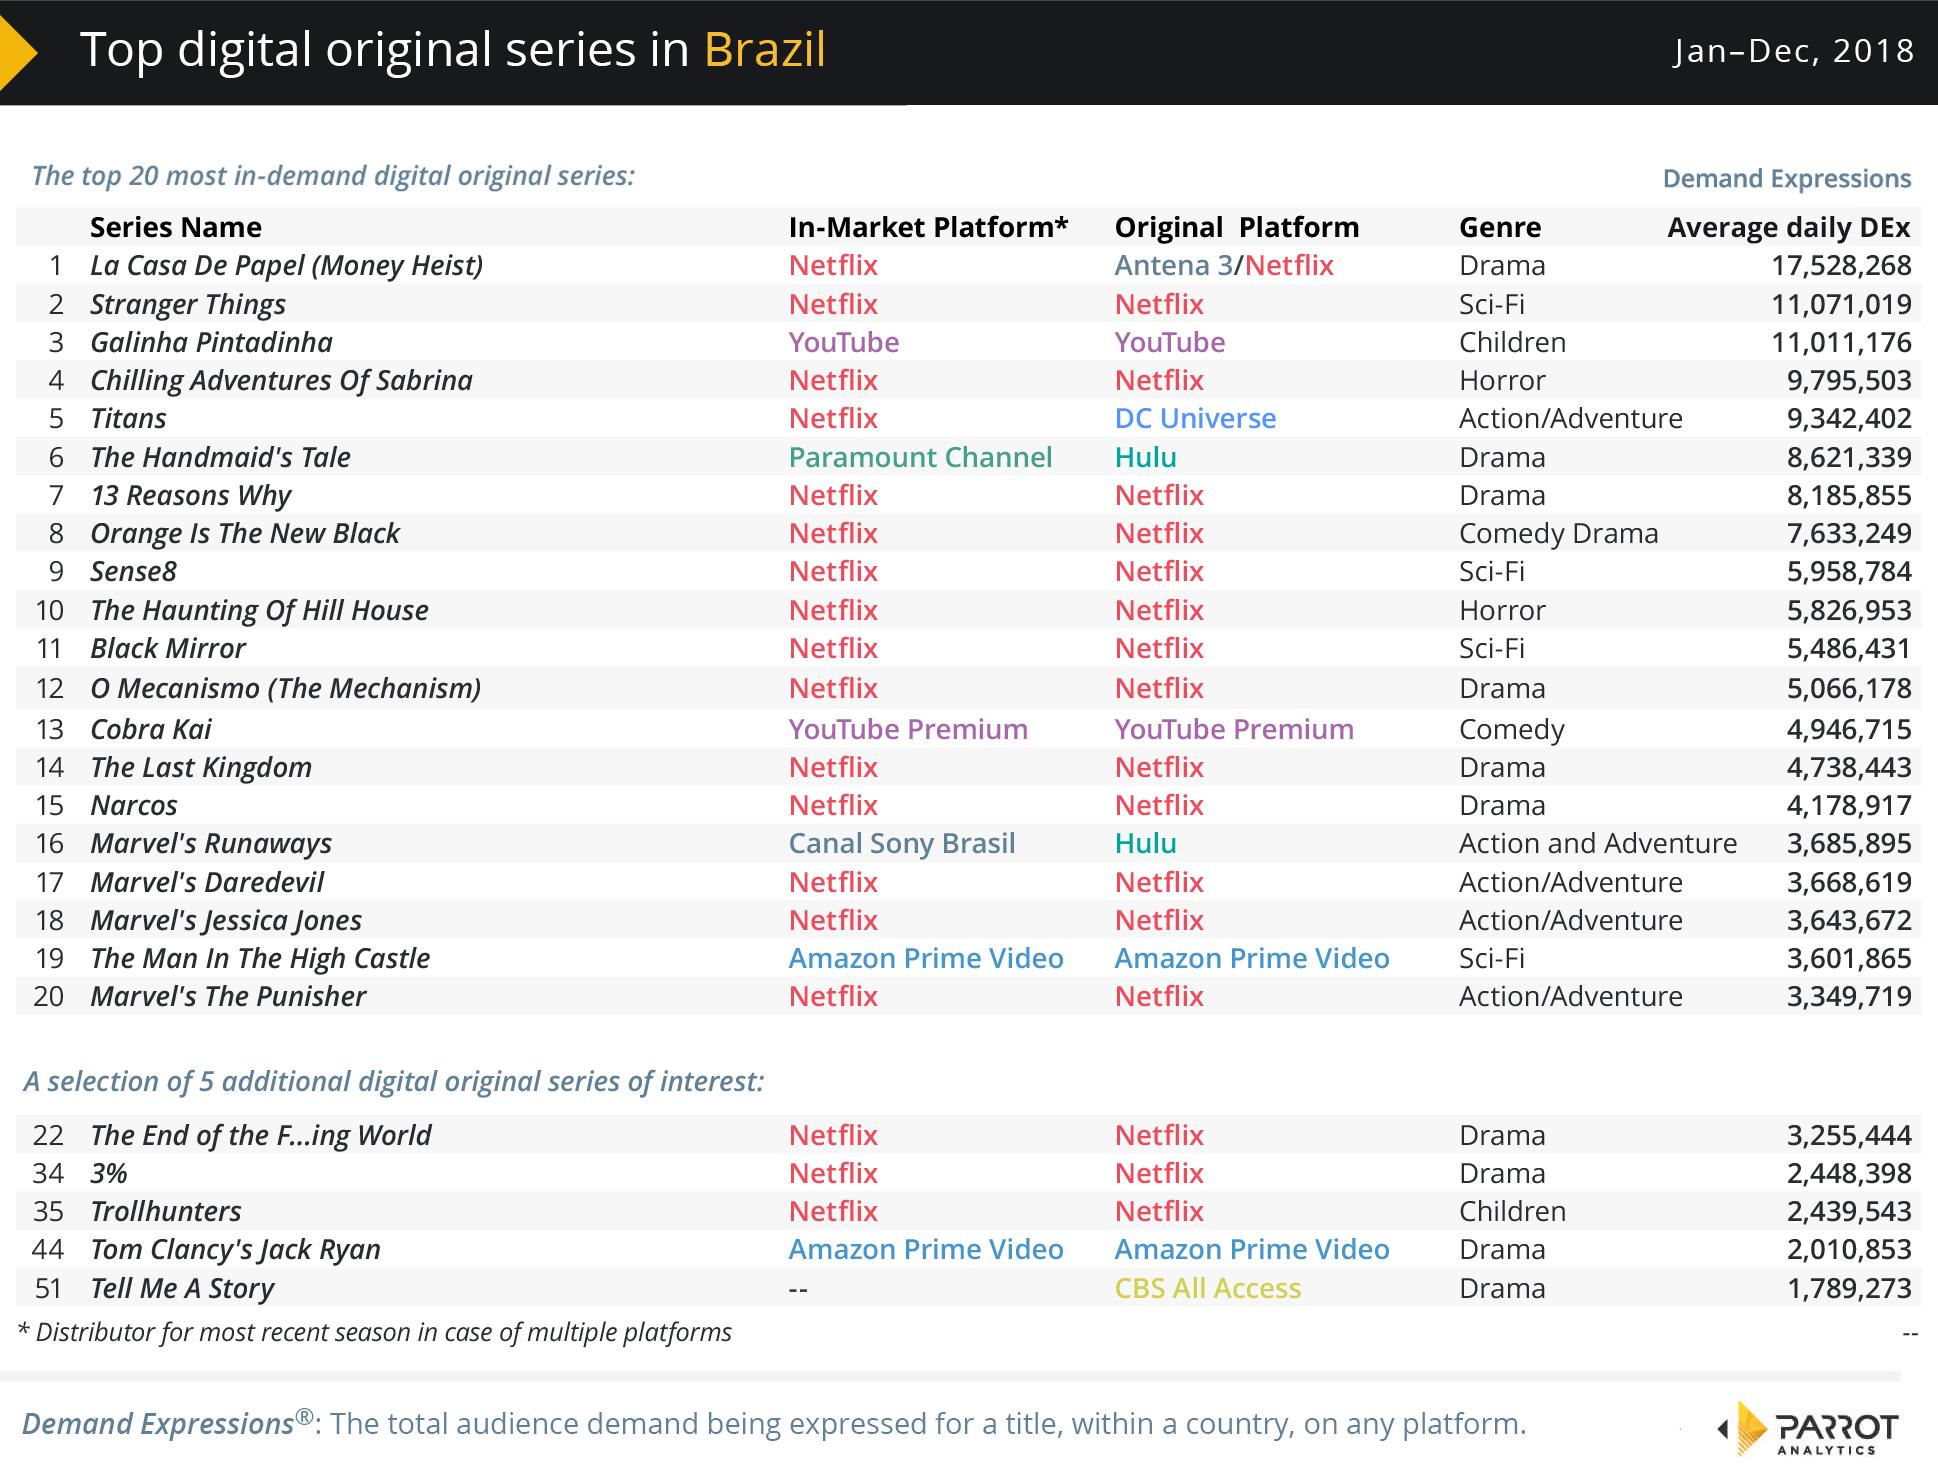 The most popular digital TV series in Brazil in 2018